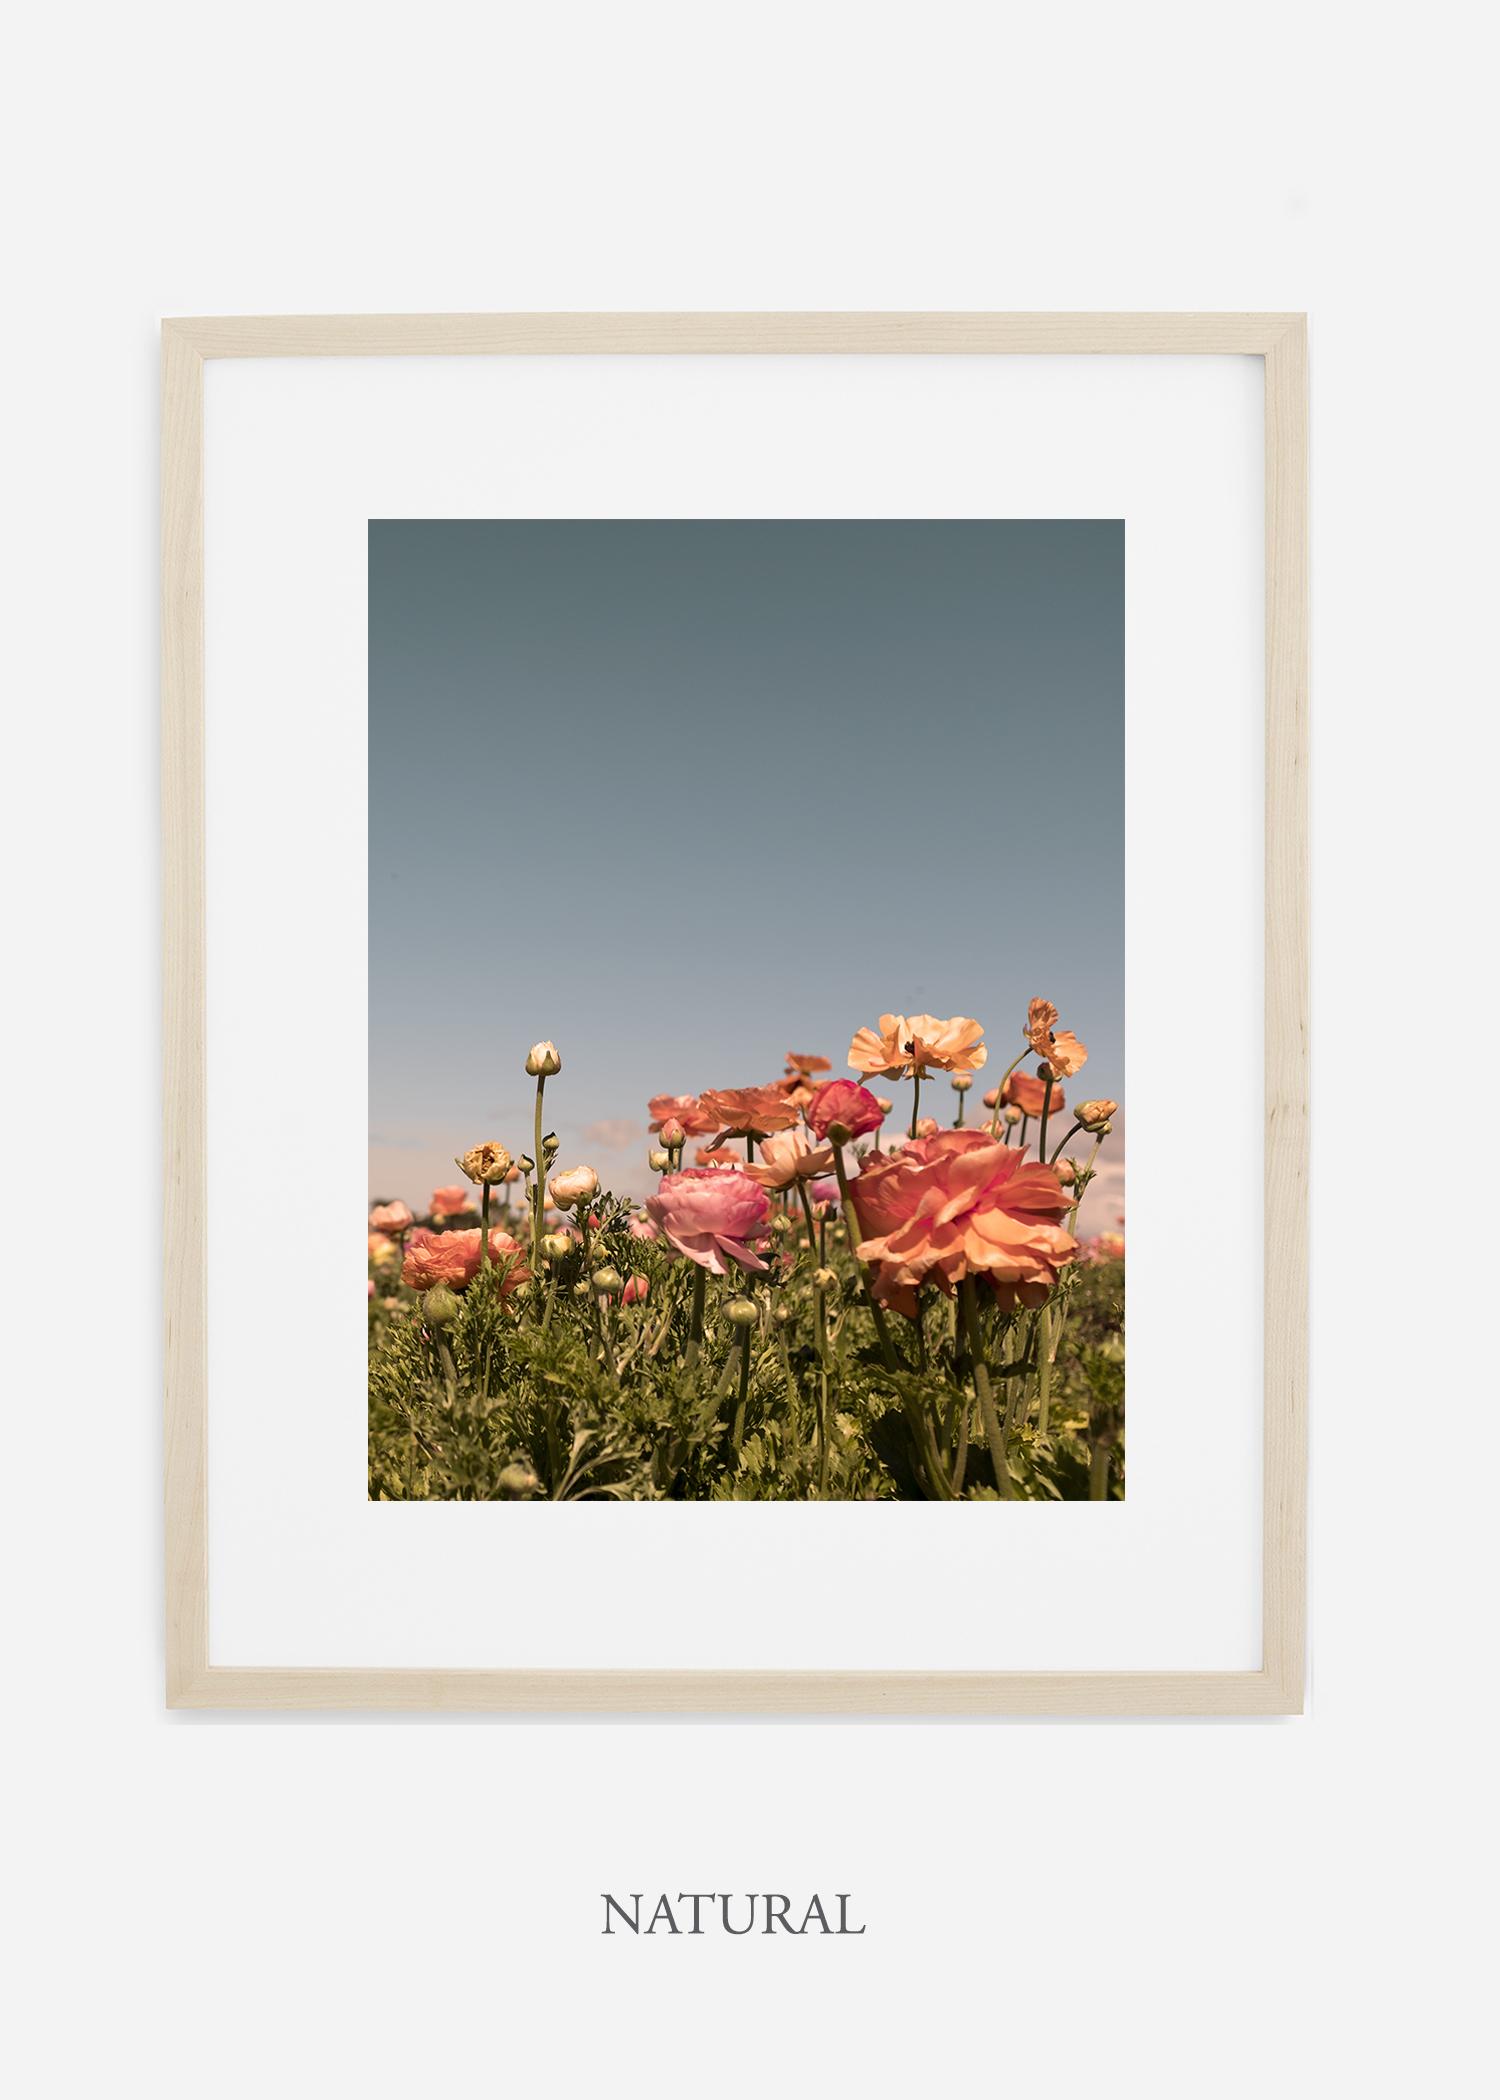 FloraNo.1-natural-wood-frame_mat-interiordesign-botanicalprint-art.jpg